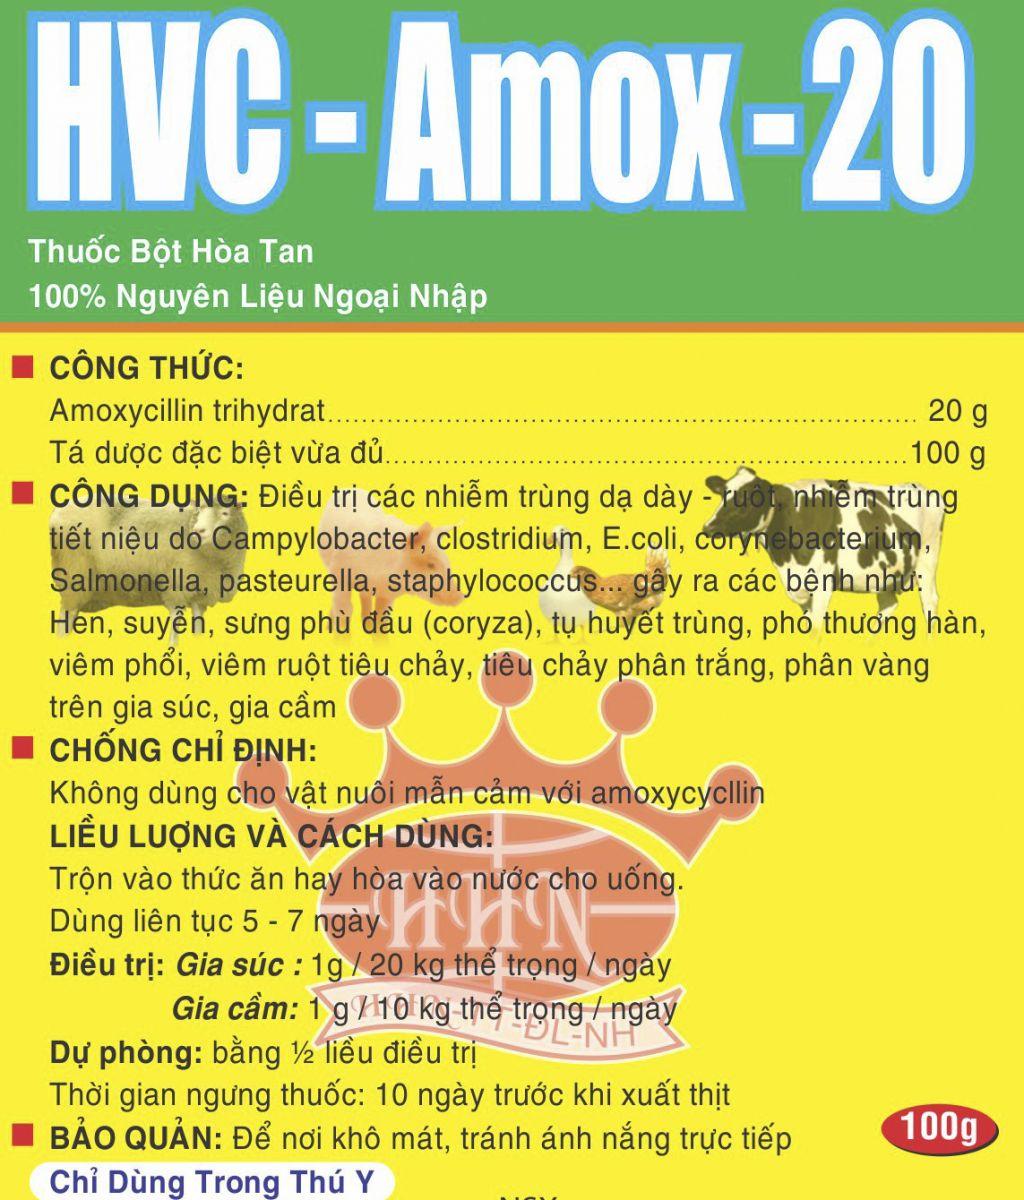 Thuốc thú y HCV - Amox 20